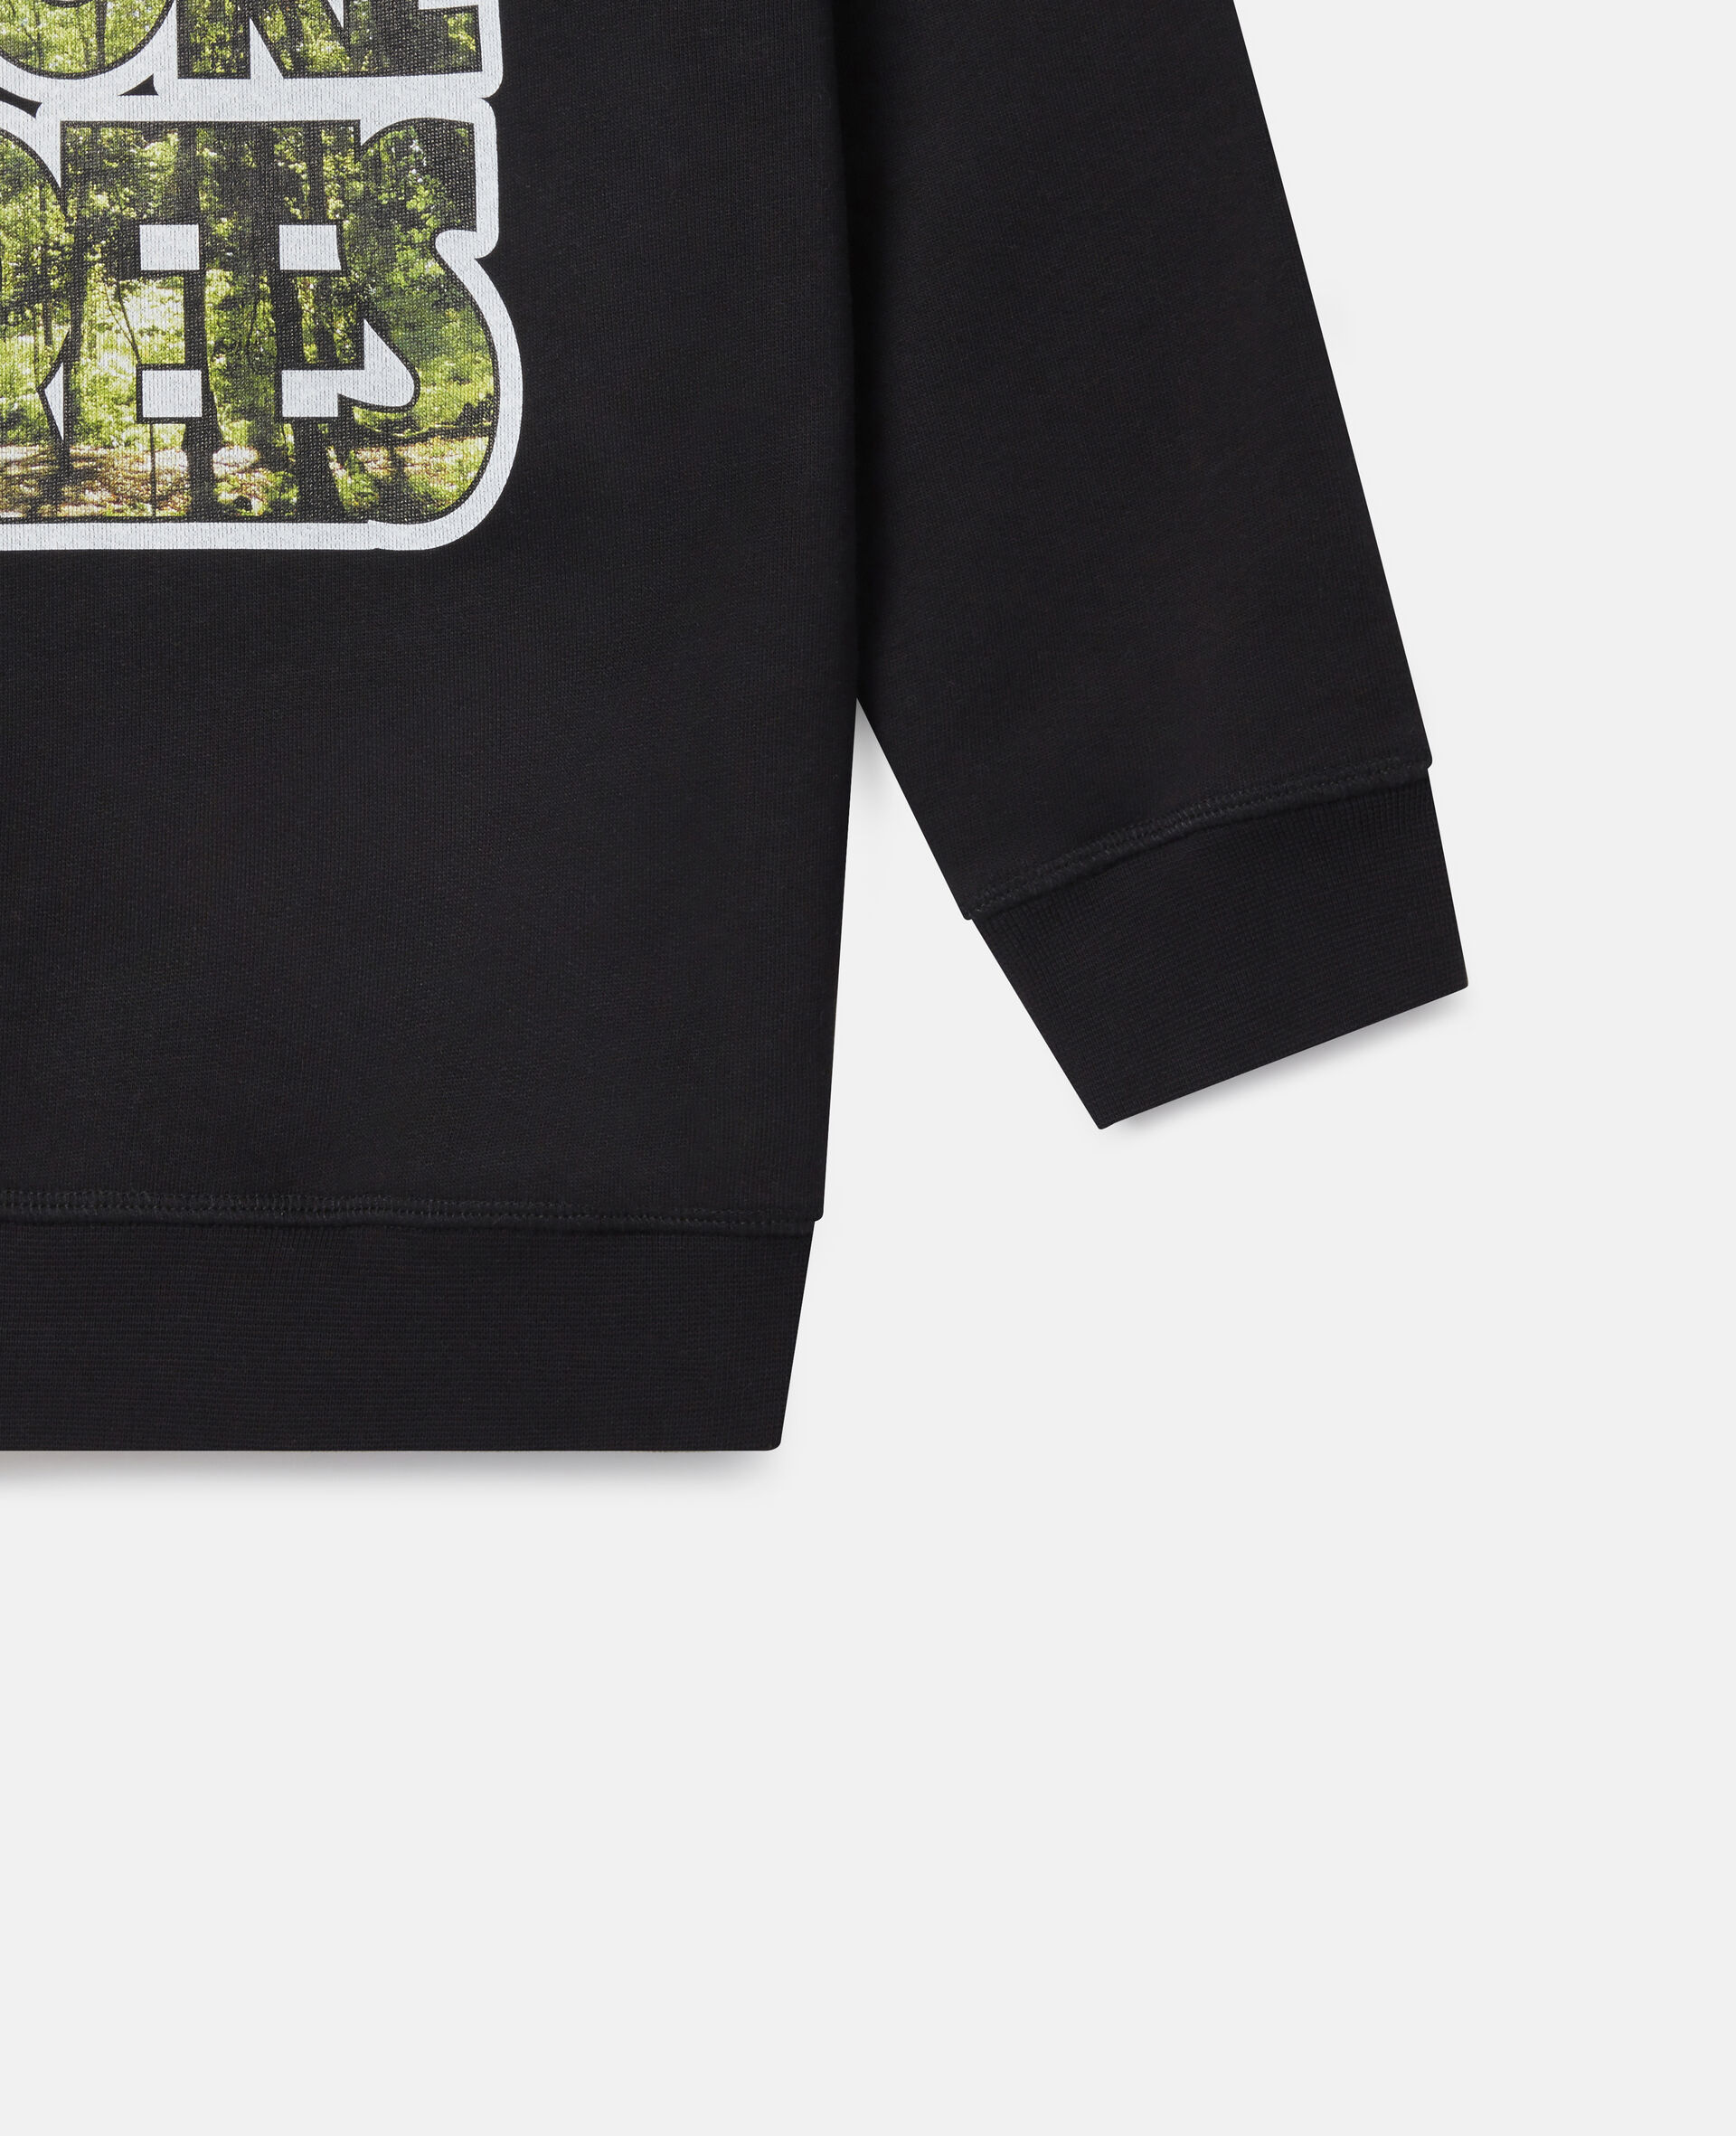 Oversized 'Plant More Trees' Fleece Sweatshirt-Black-large image number 2